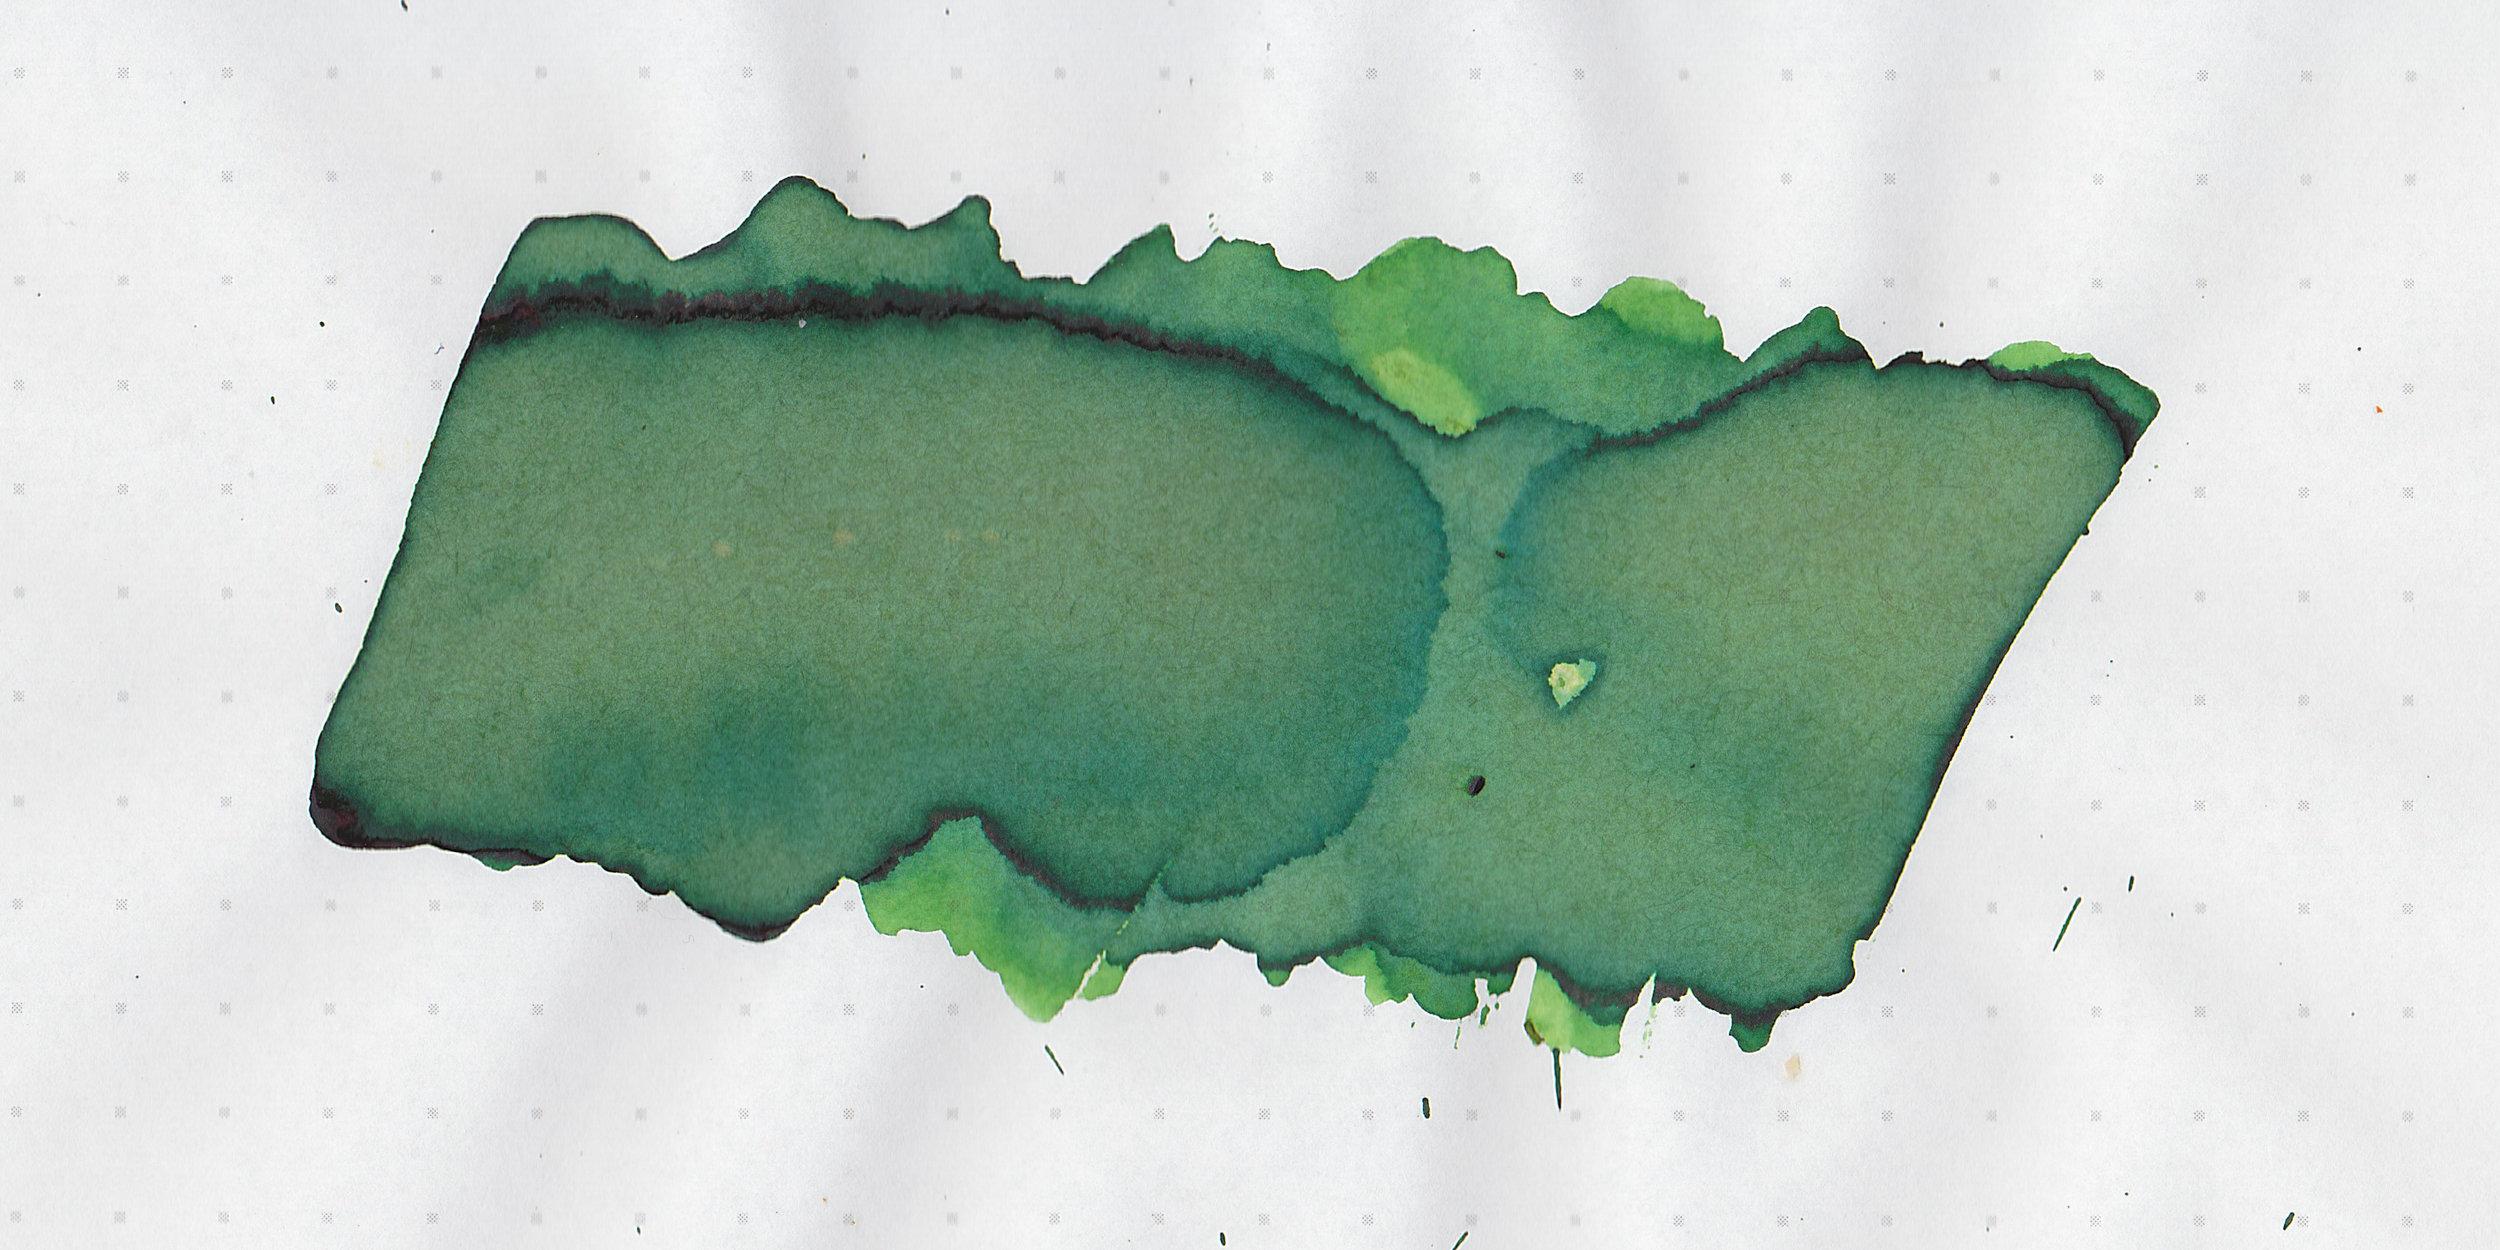 ro-forest-green-4.jpg